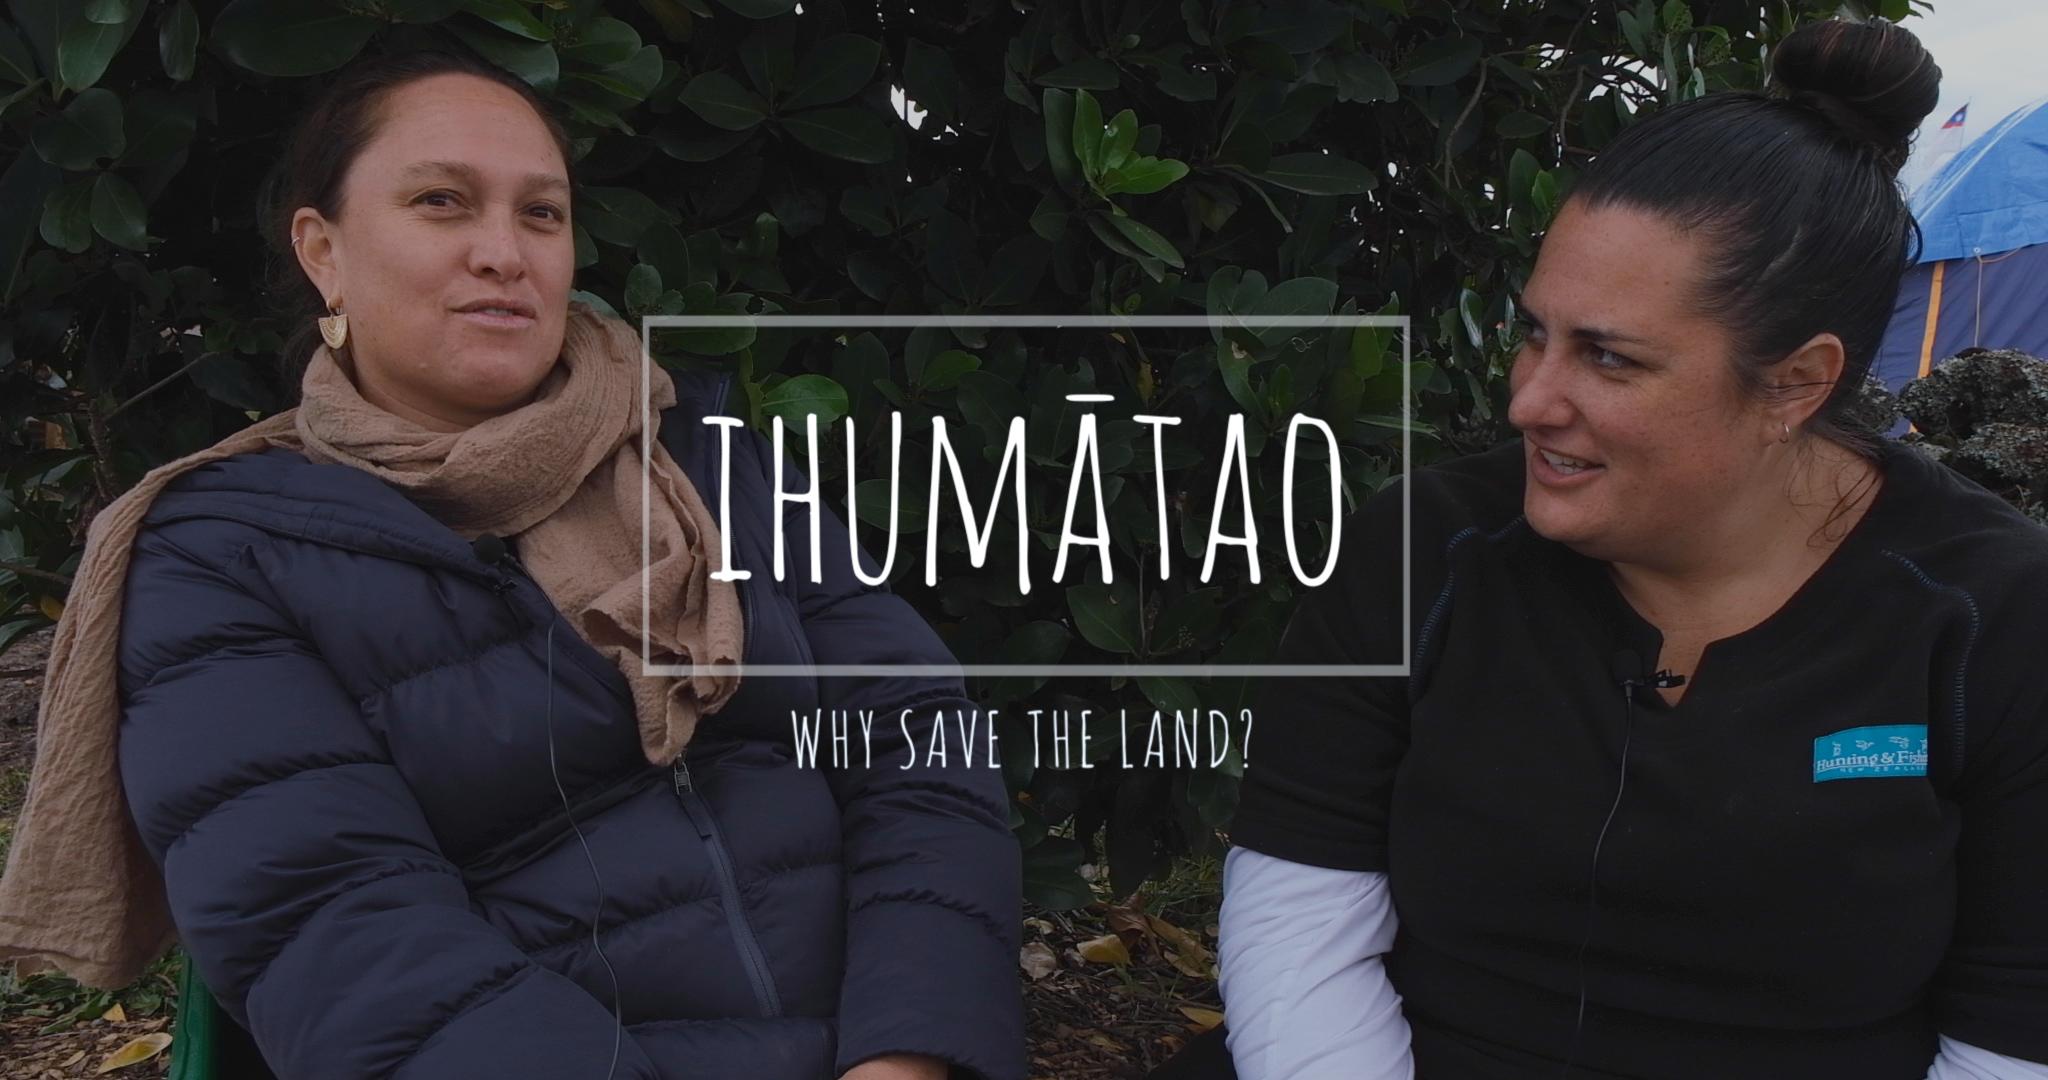 Ihumātao: Why Save the Land